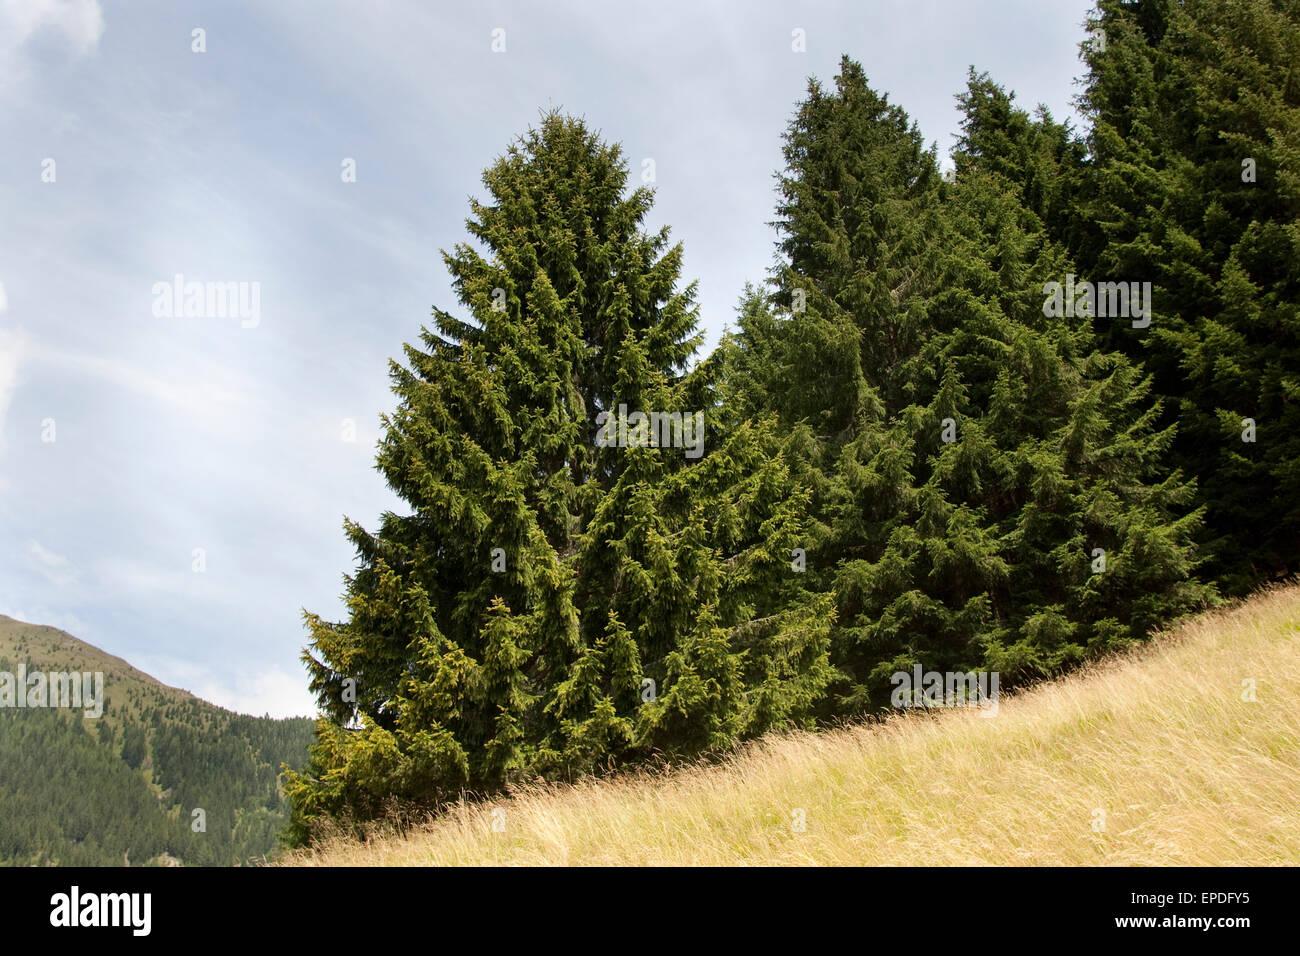 Common Spruce, Christmas Tree, Gewöhnliche Fichte, Rot-Fichte, Rotfichte, Picea abies - Stock Image